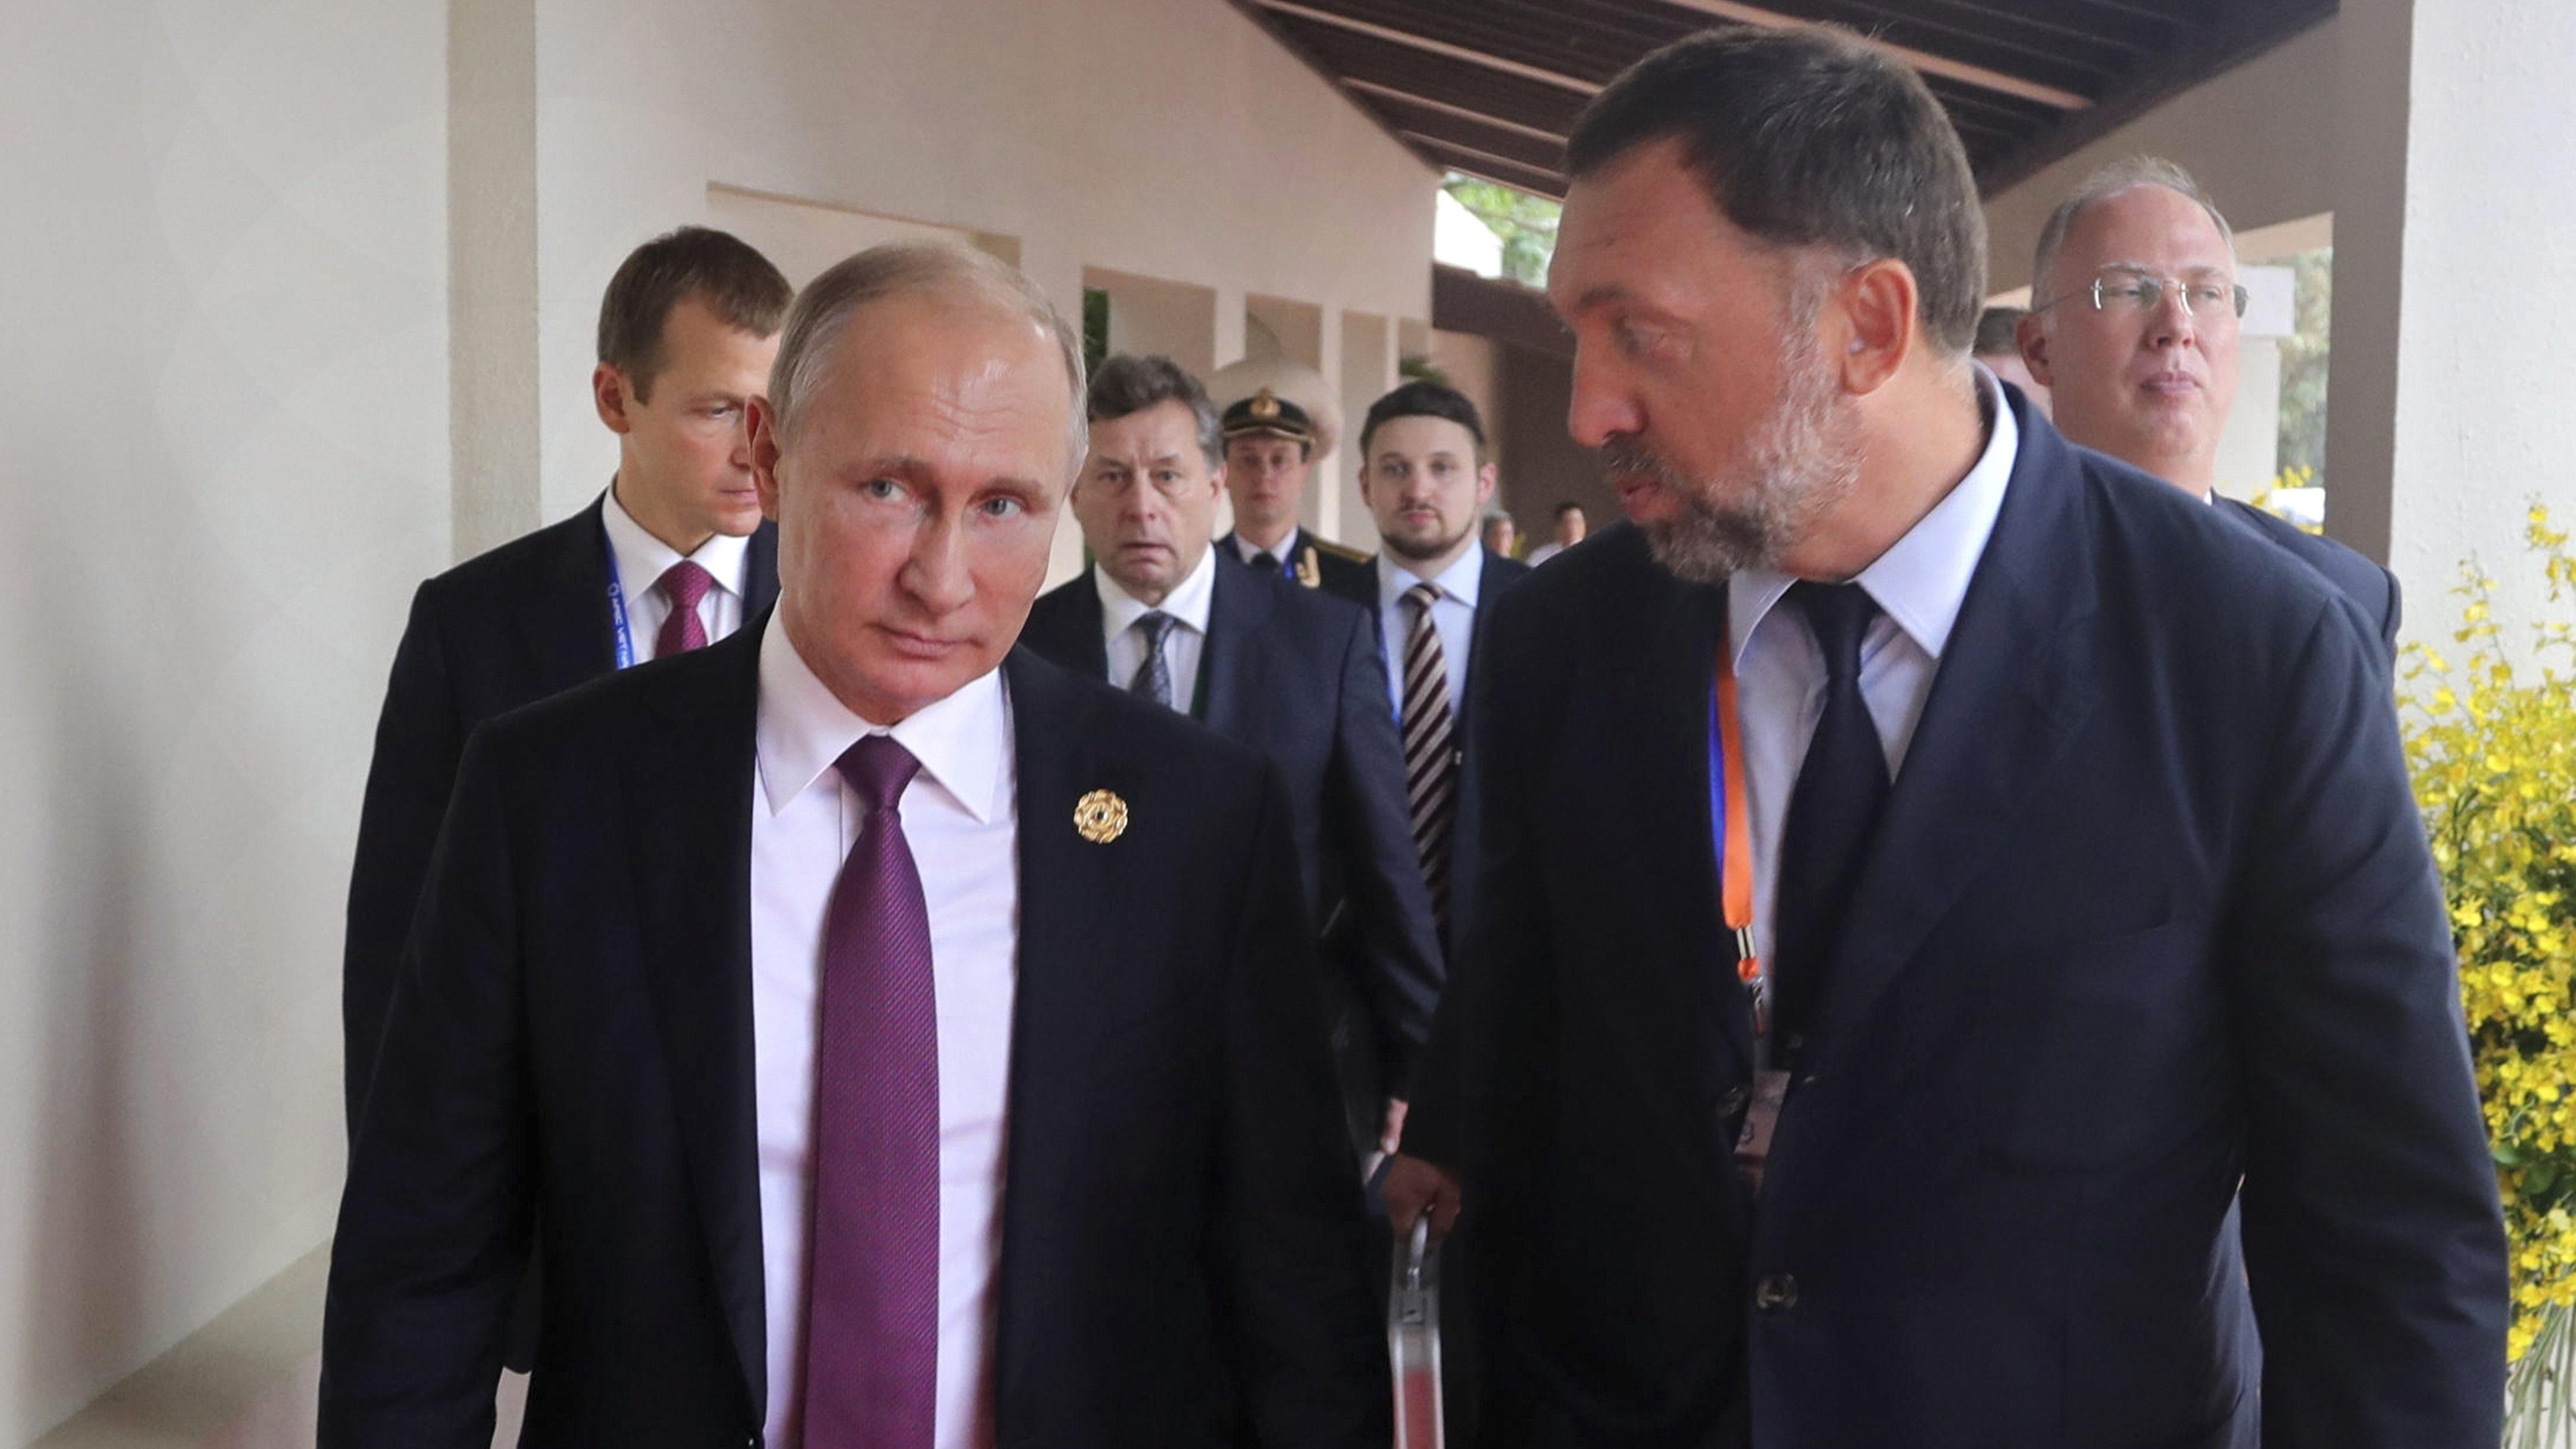 Deripaska manafort putin yacht trump russia navalny